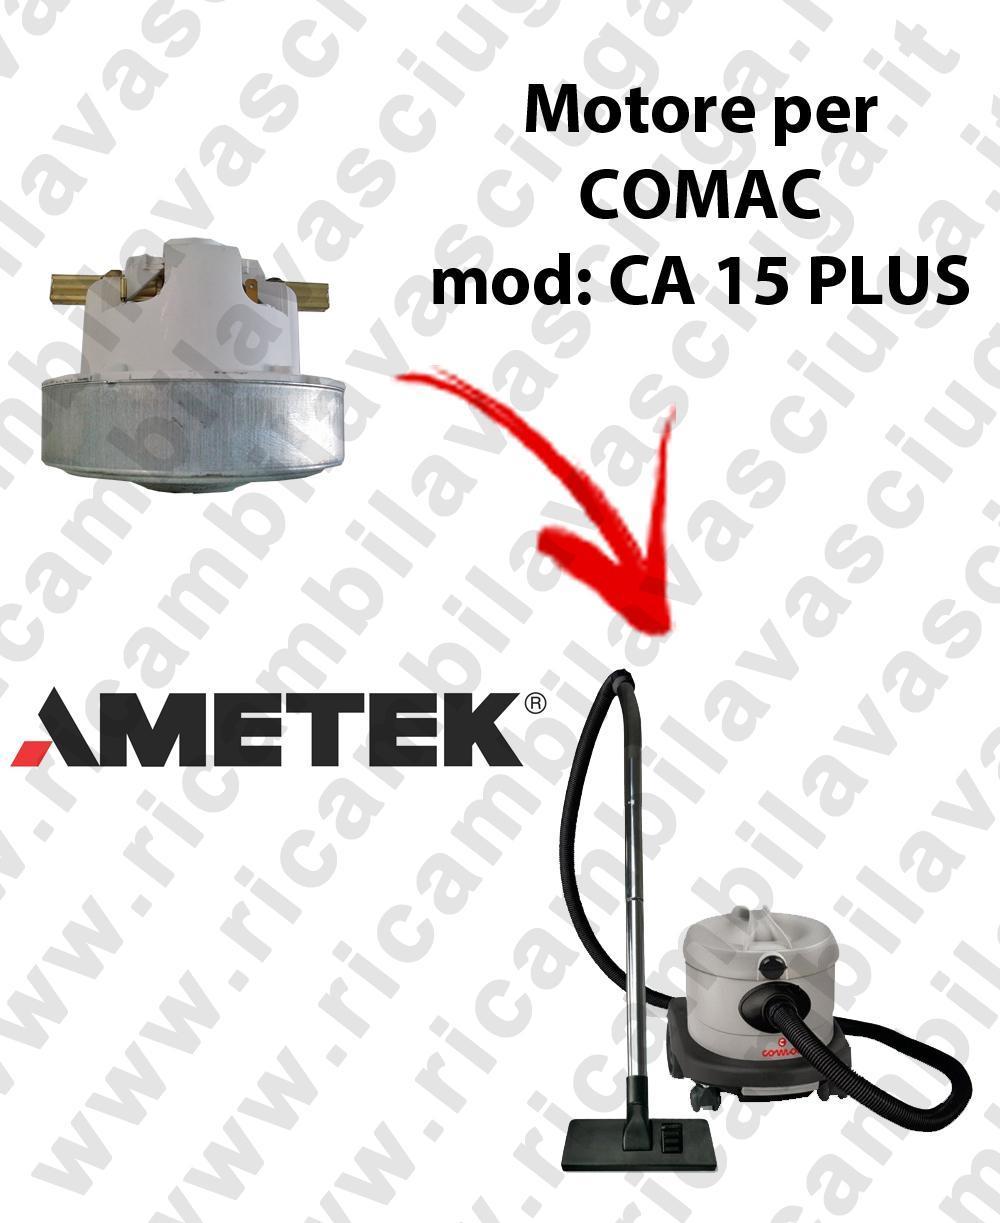 CA 15 PLUS Saugmotor AMETEK für Staubsauger COMAC